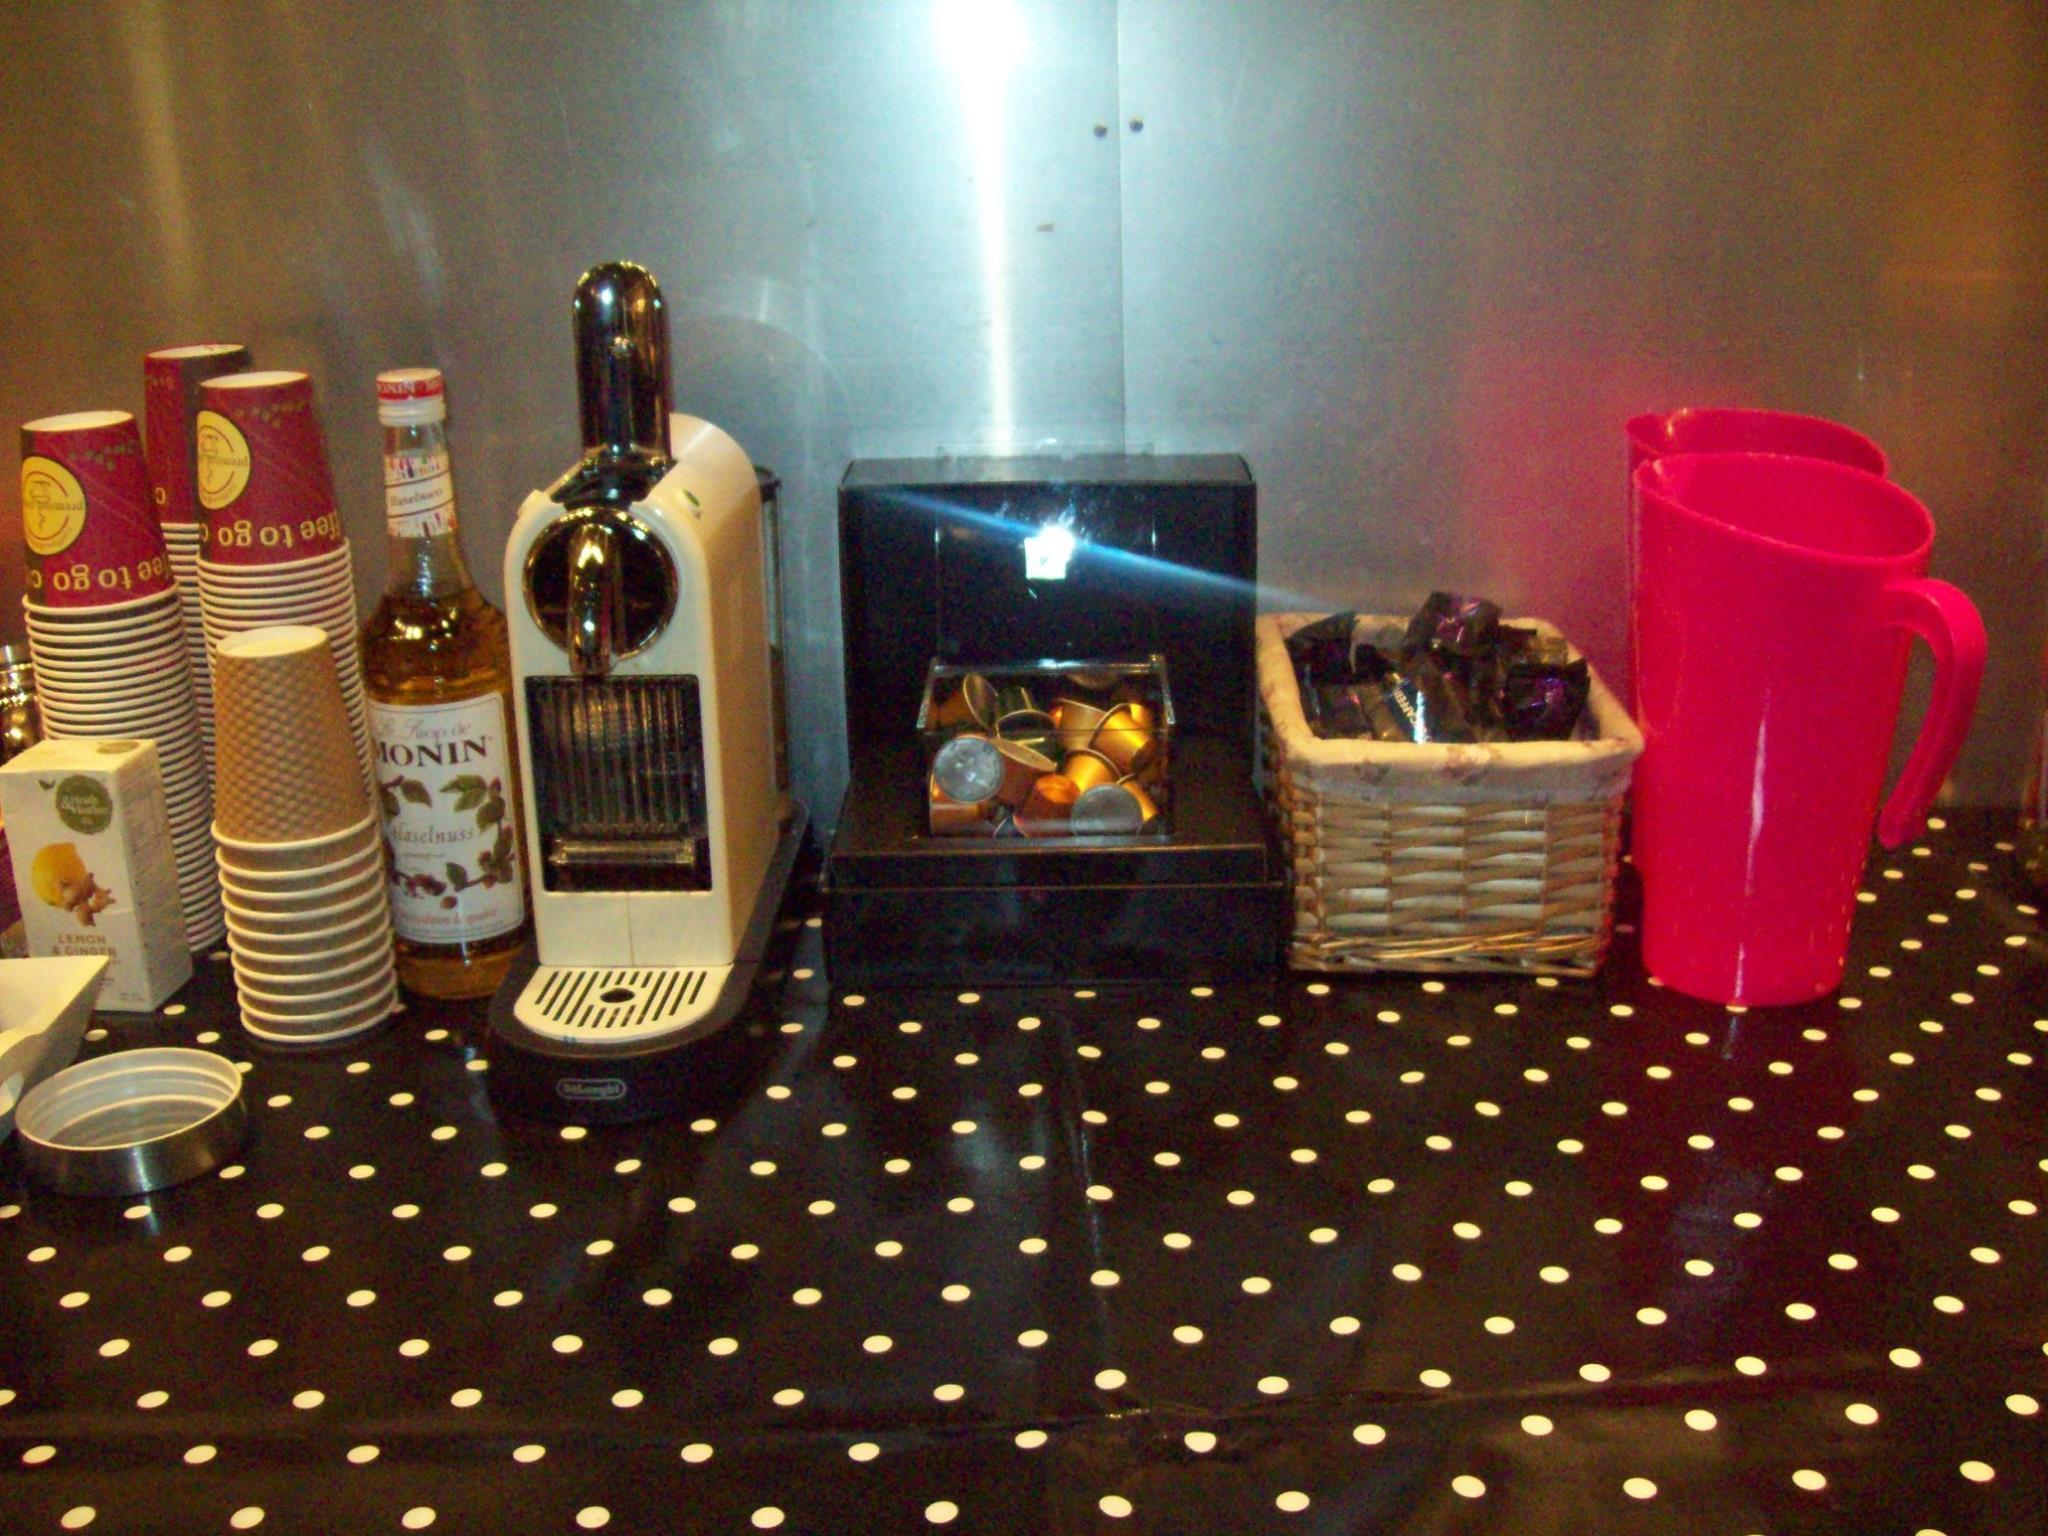 Nespresso coffee station